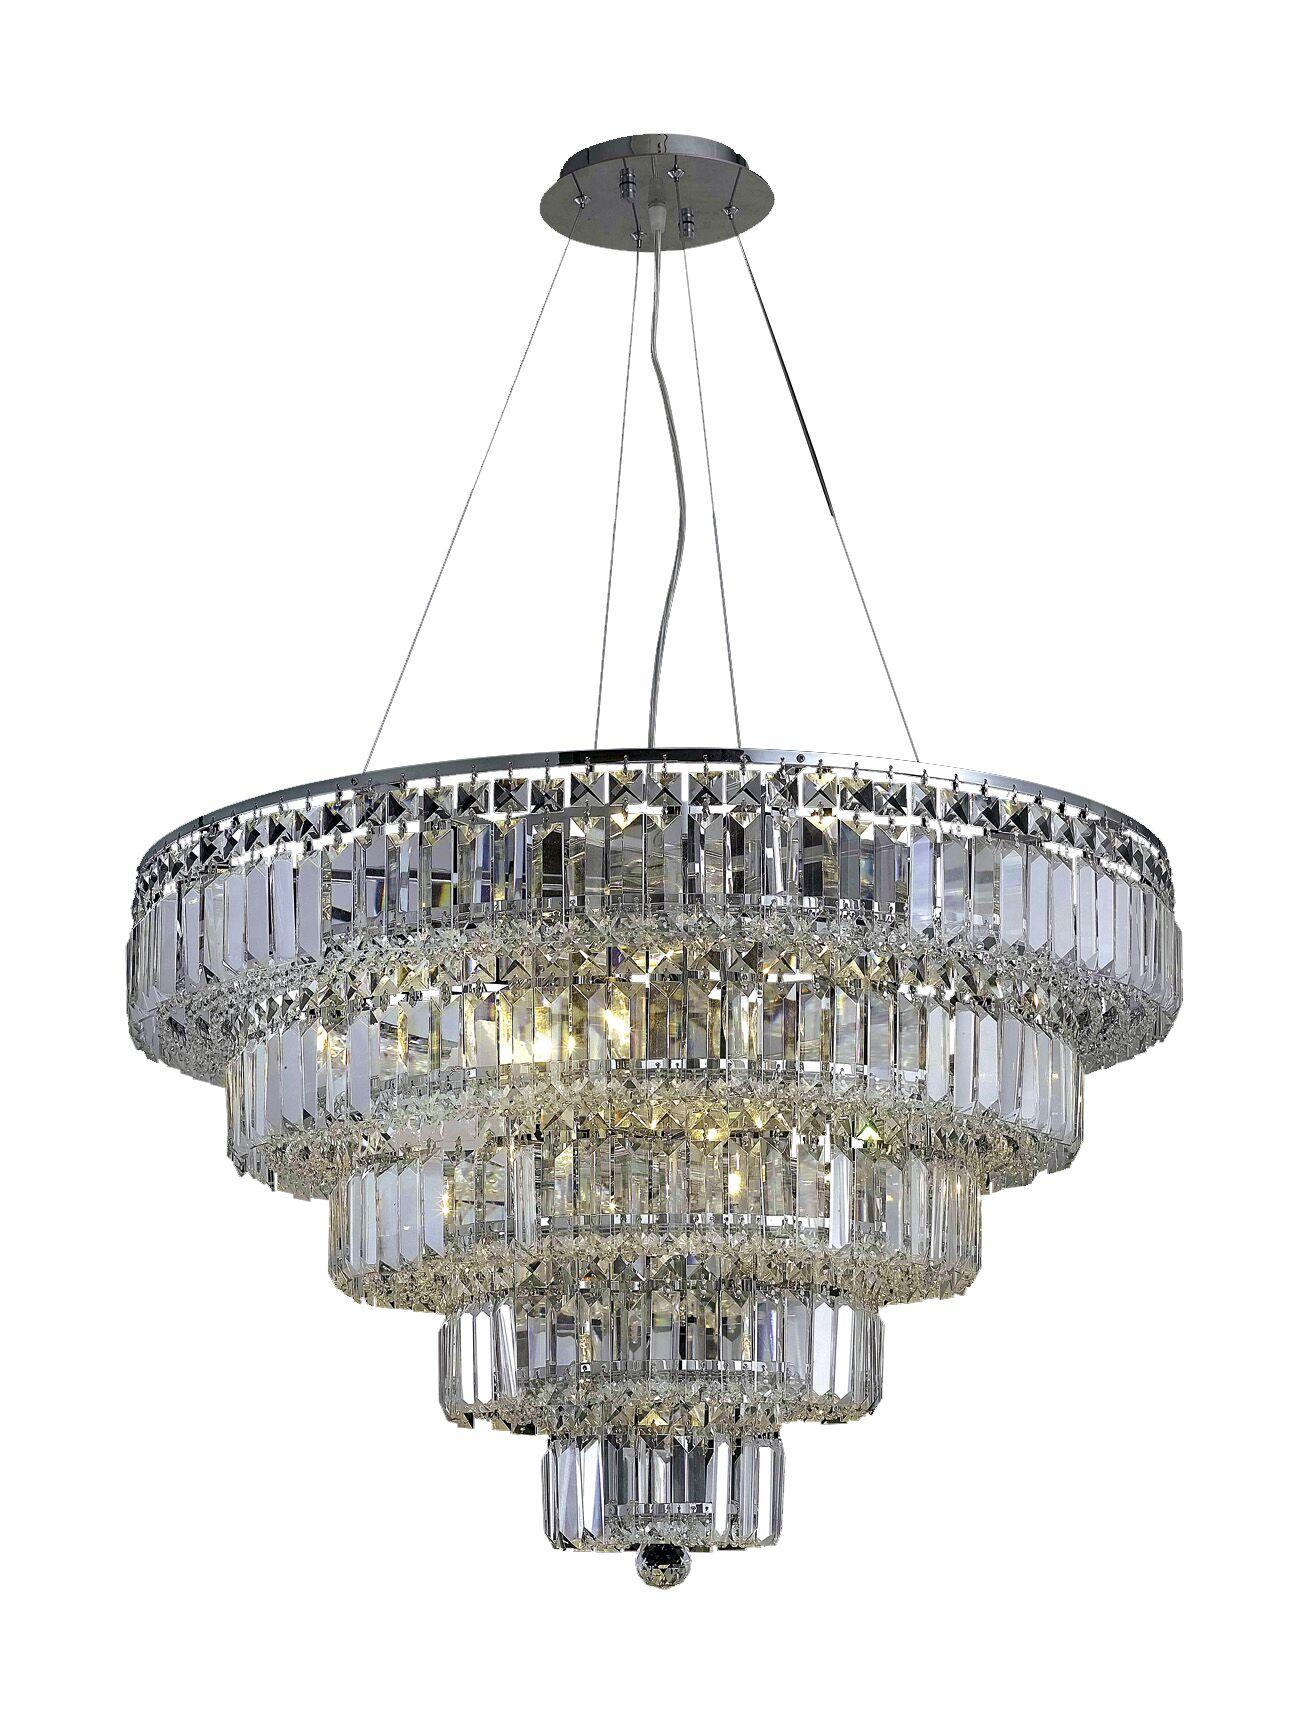 Langer 17-Light Crystal Chandelier Finish: Chrome, Crystal Grade: Swarovski Strass